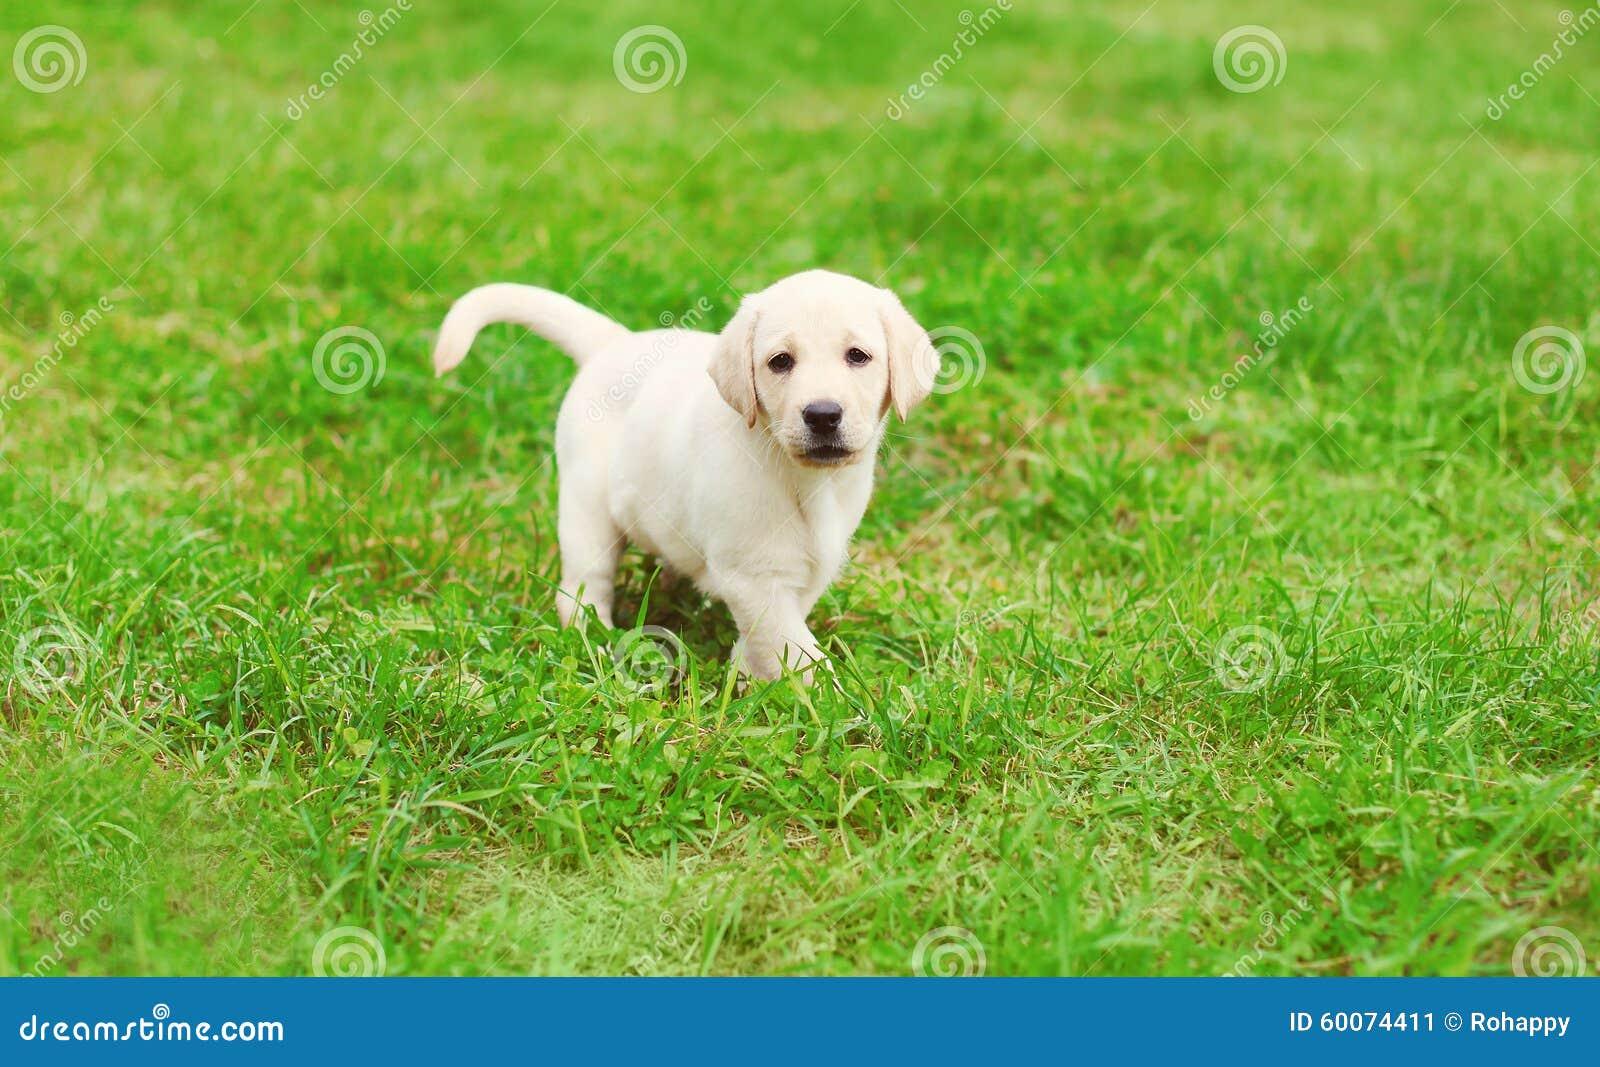 Cute Dog Puppy Labrador Retriever Running Stock Image Image Of Doggy Field 60074411